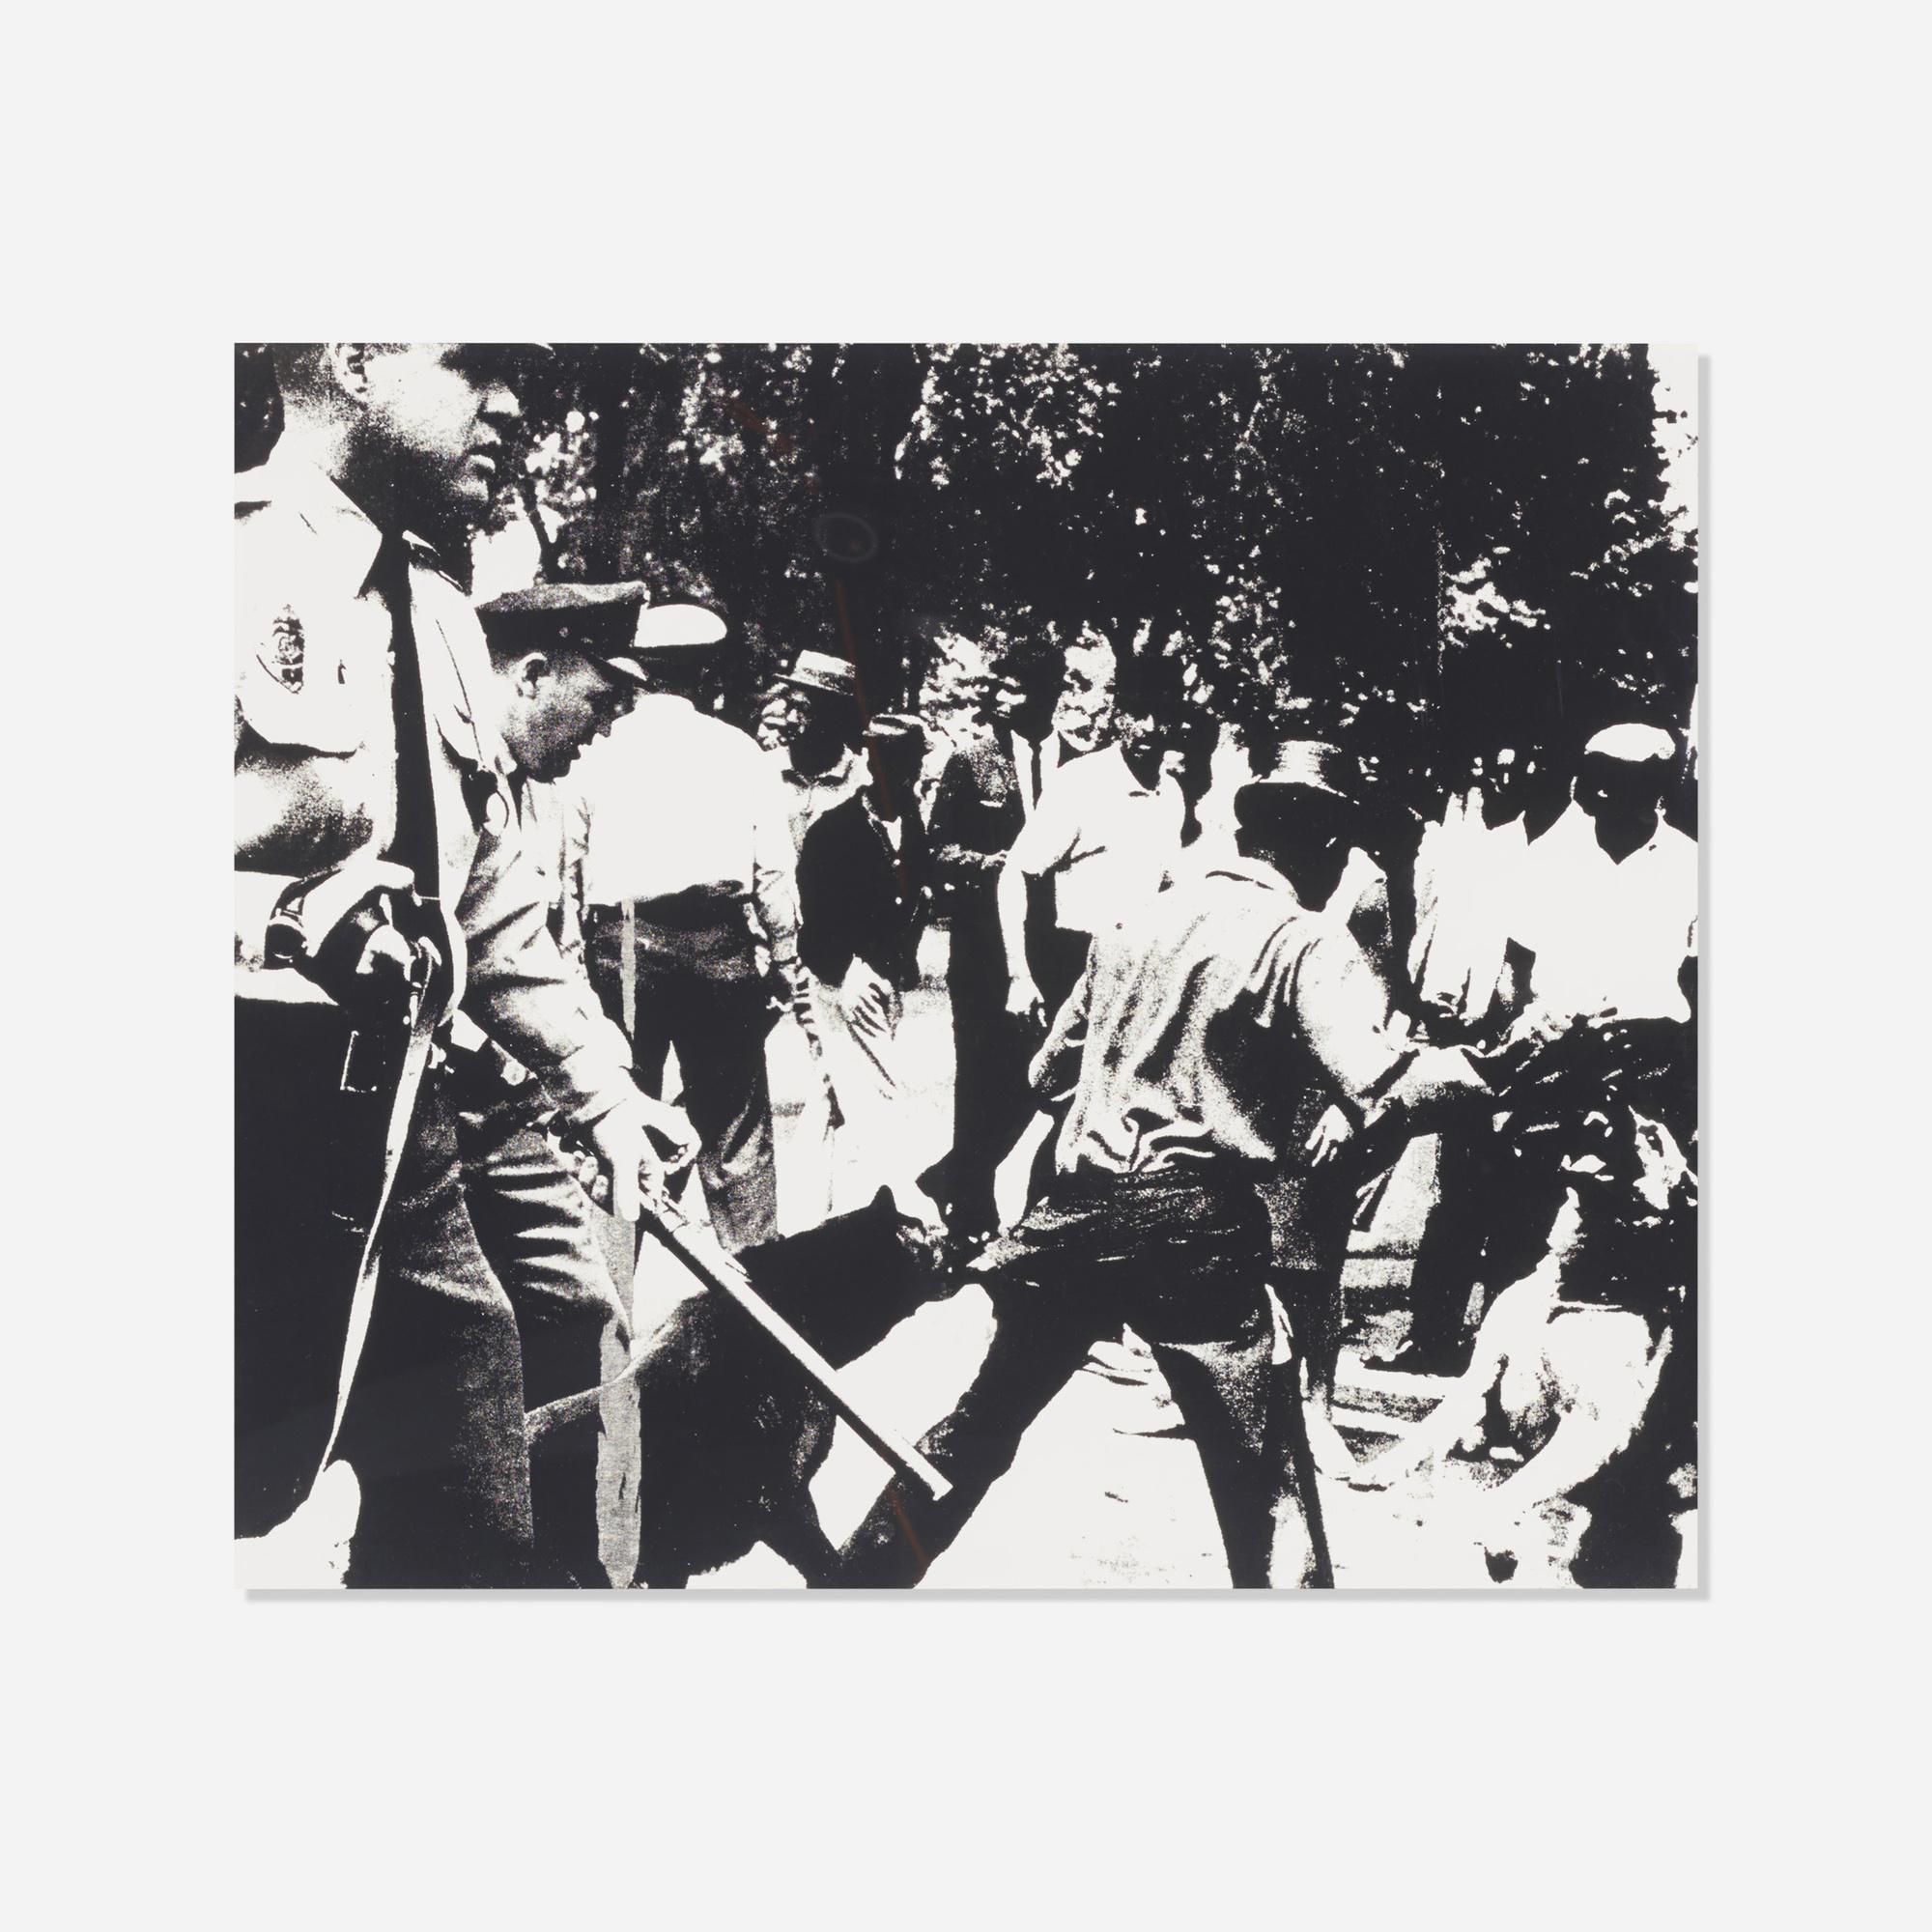 203: Andy Warhol / Birmingham Race Riot (from the Ten Works X Ten Painters portfolio) (1 of 1)